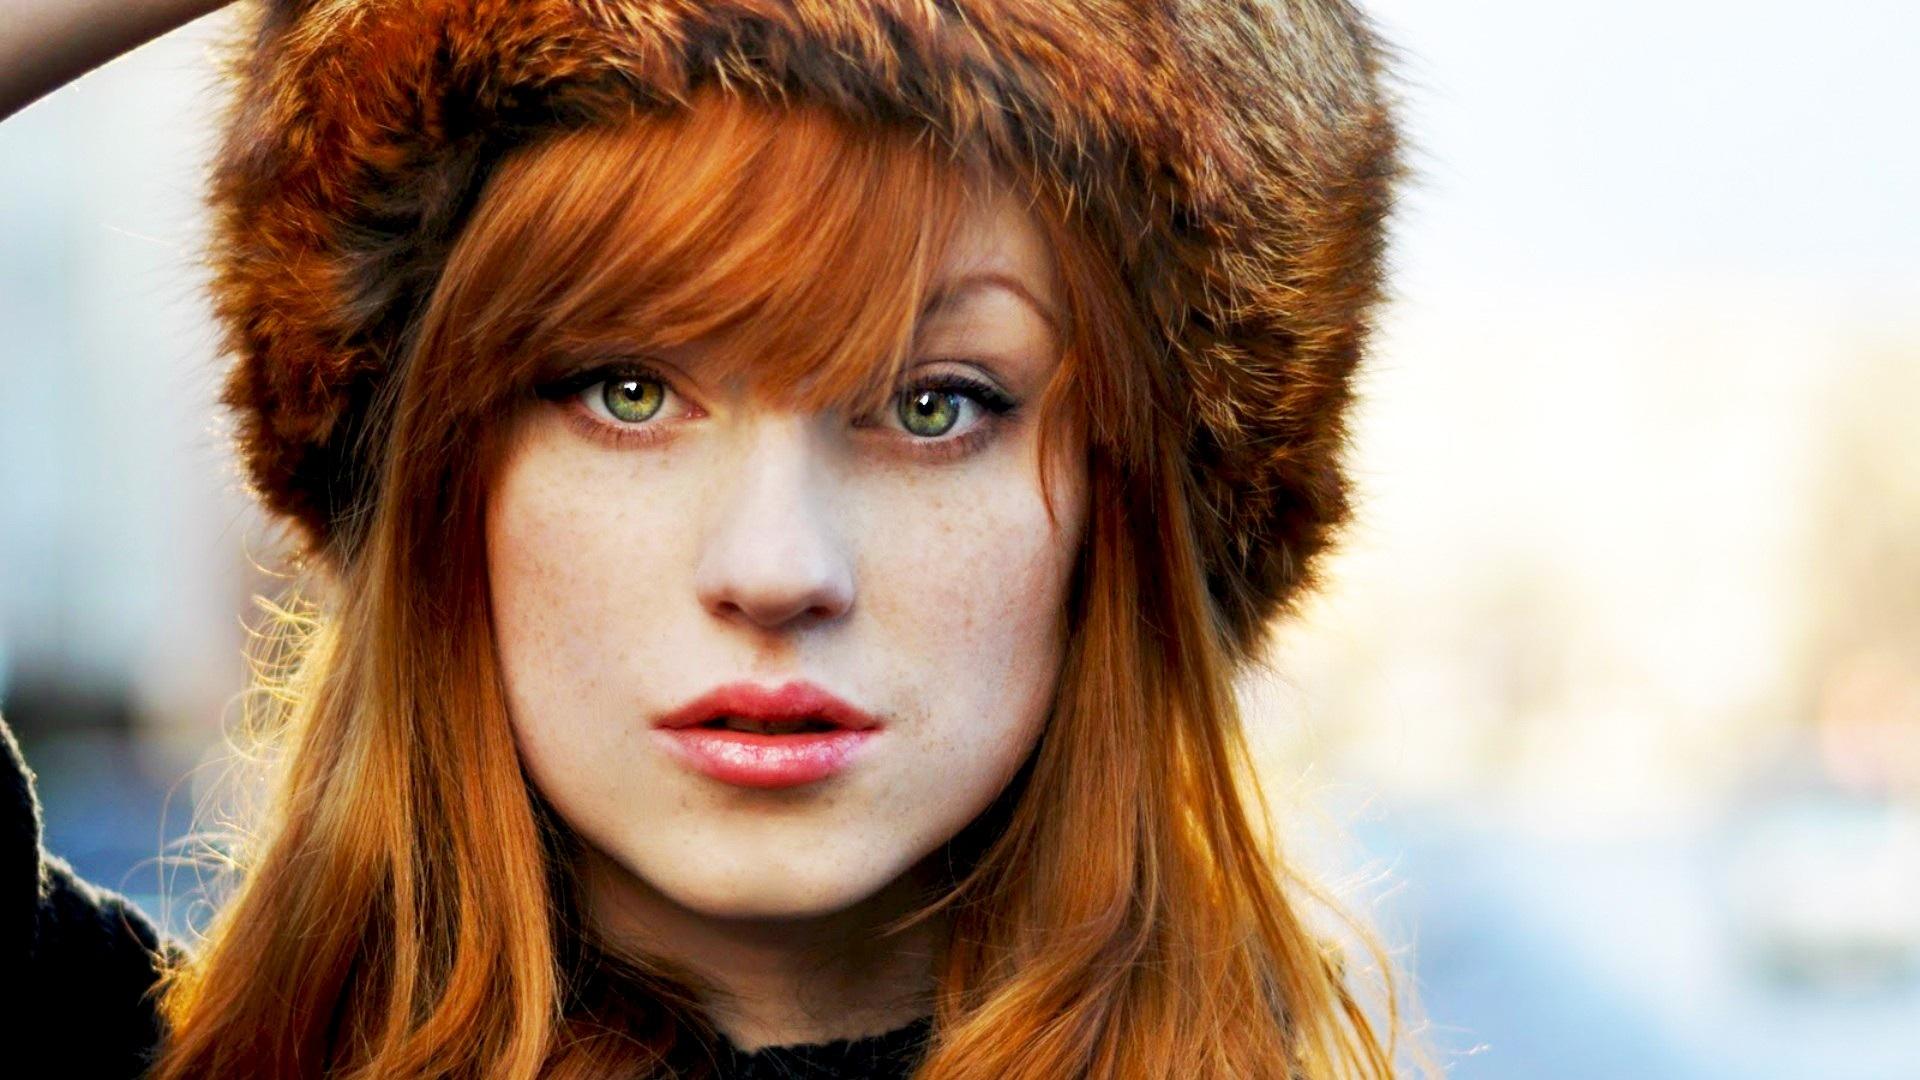 Beautiful Redhead Girl With Fur Hat